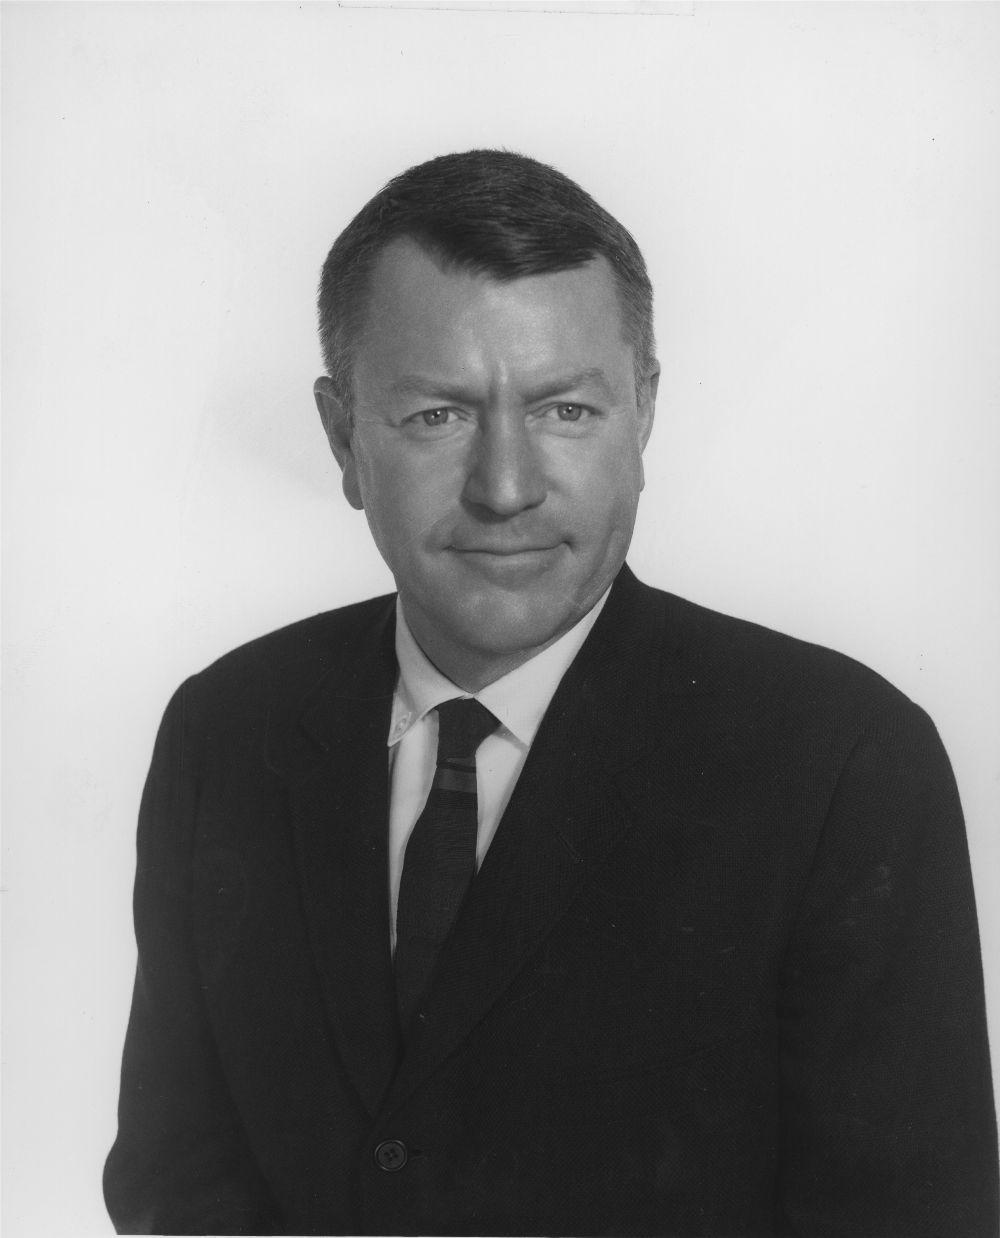 Chester Louis Mize